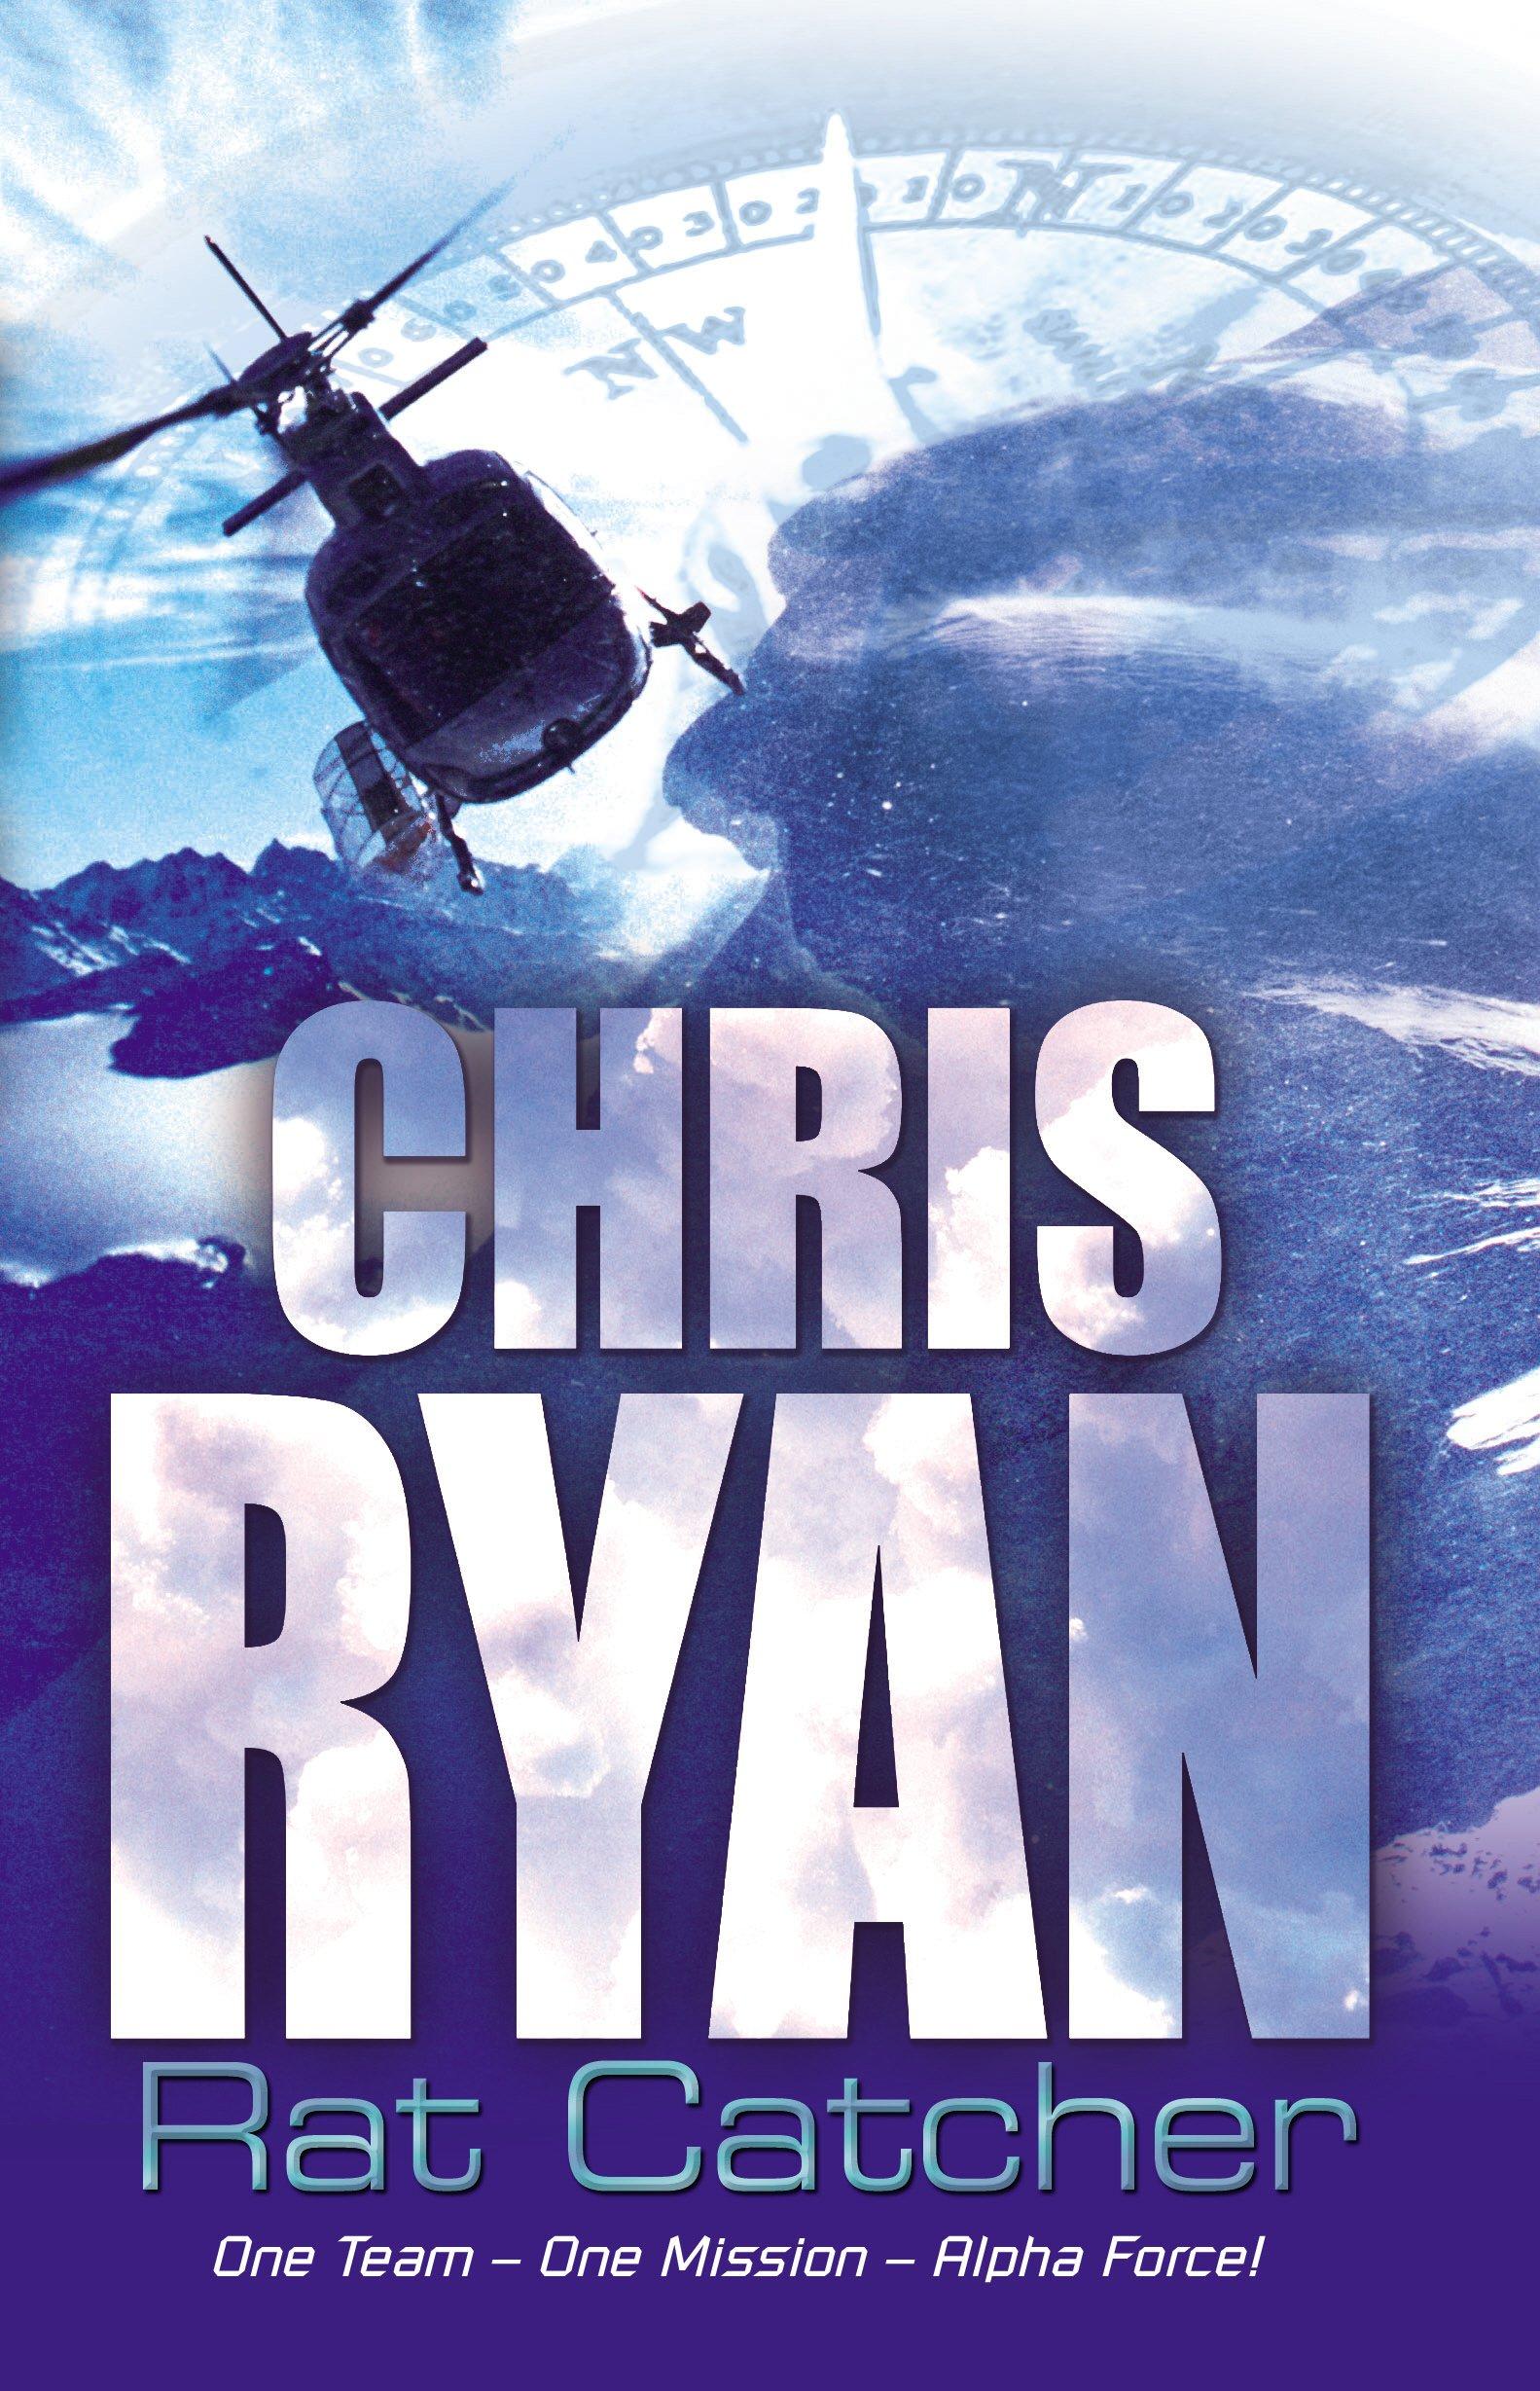 Book cover of Rat Catcher